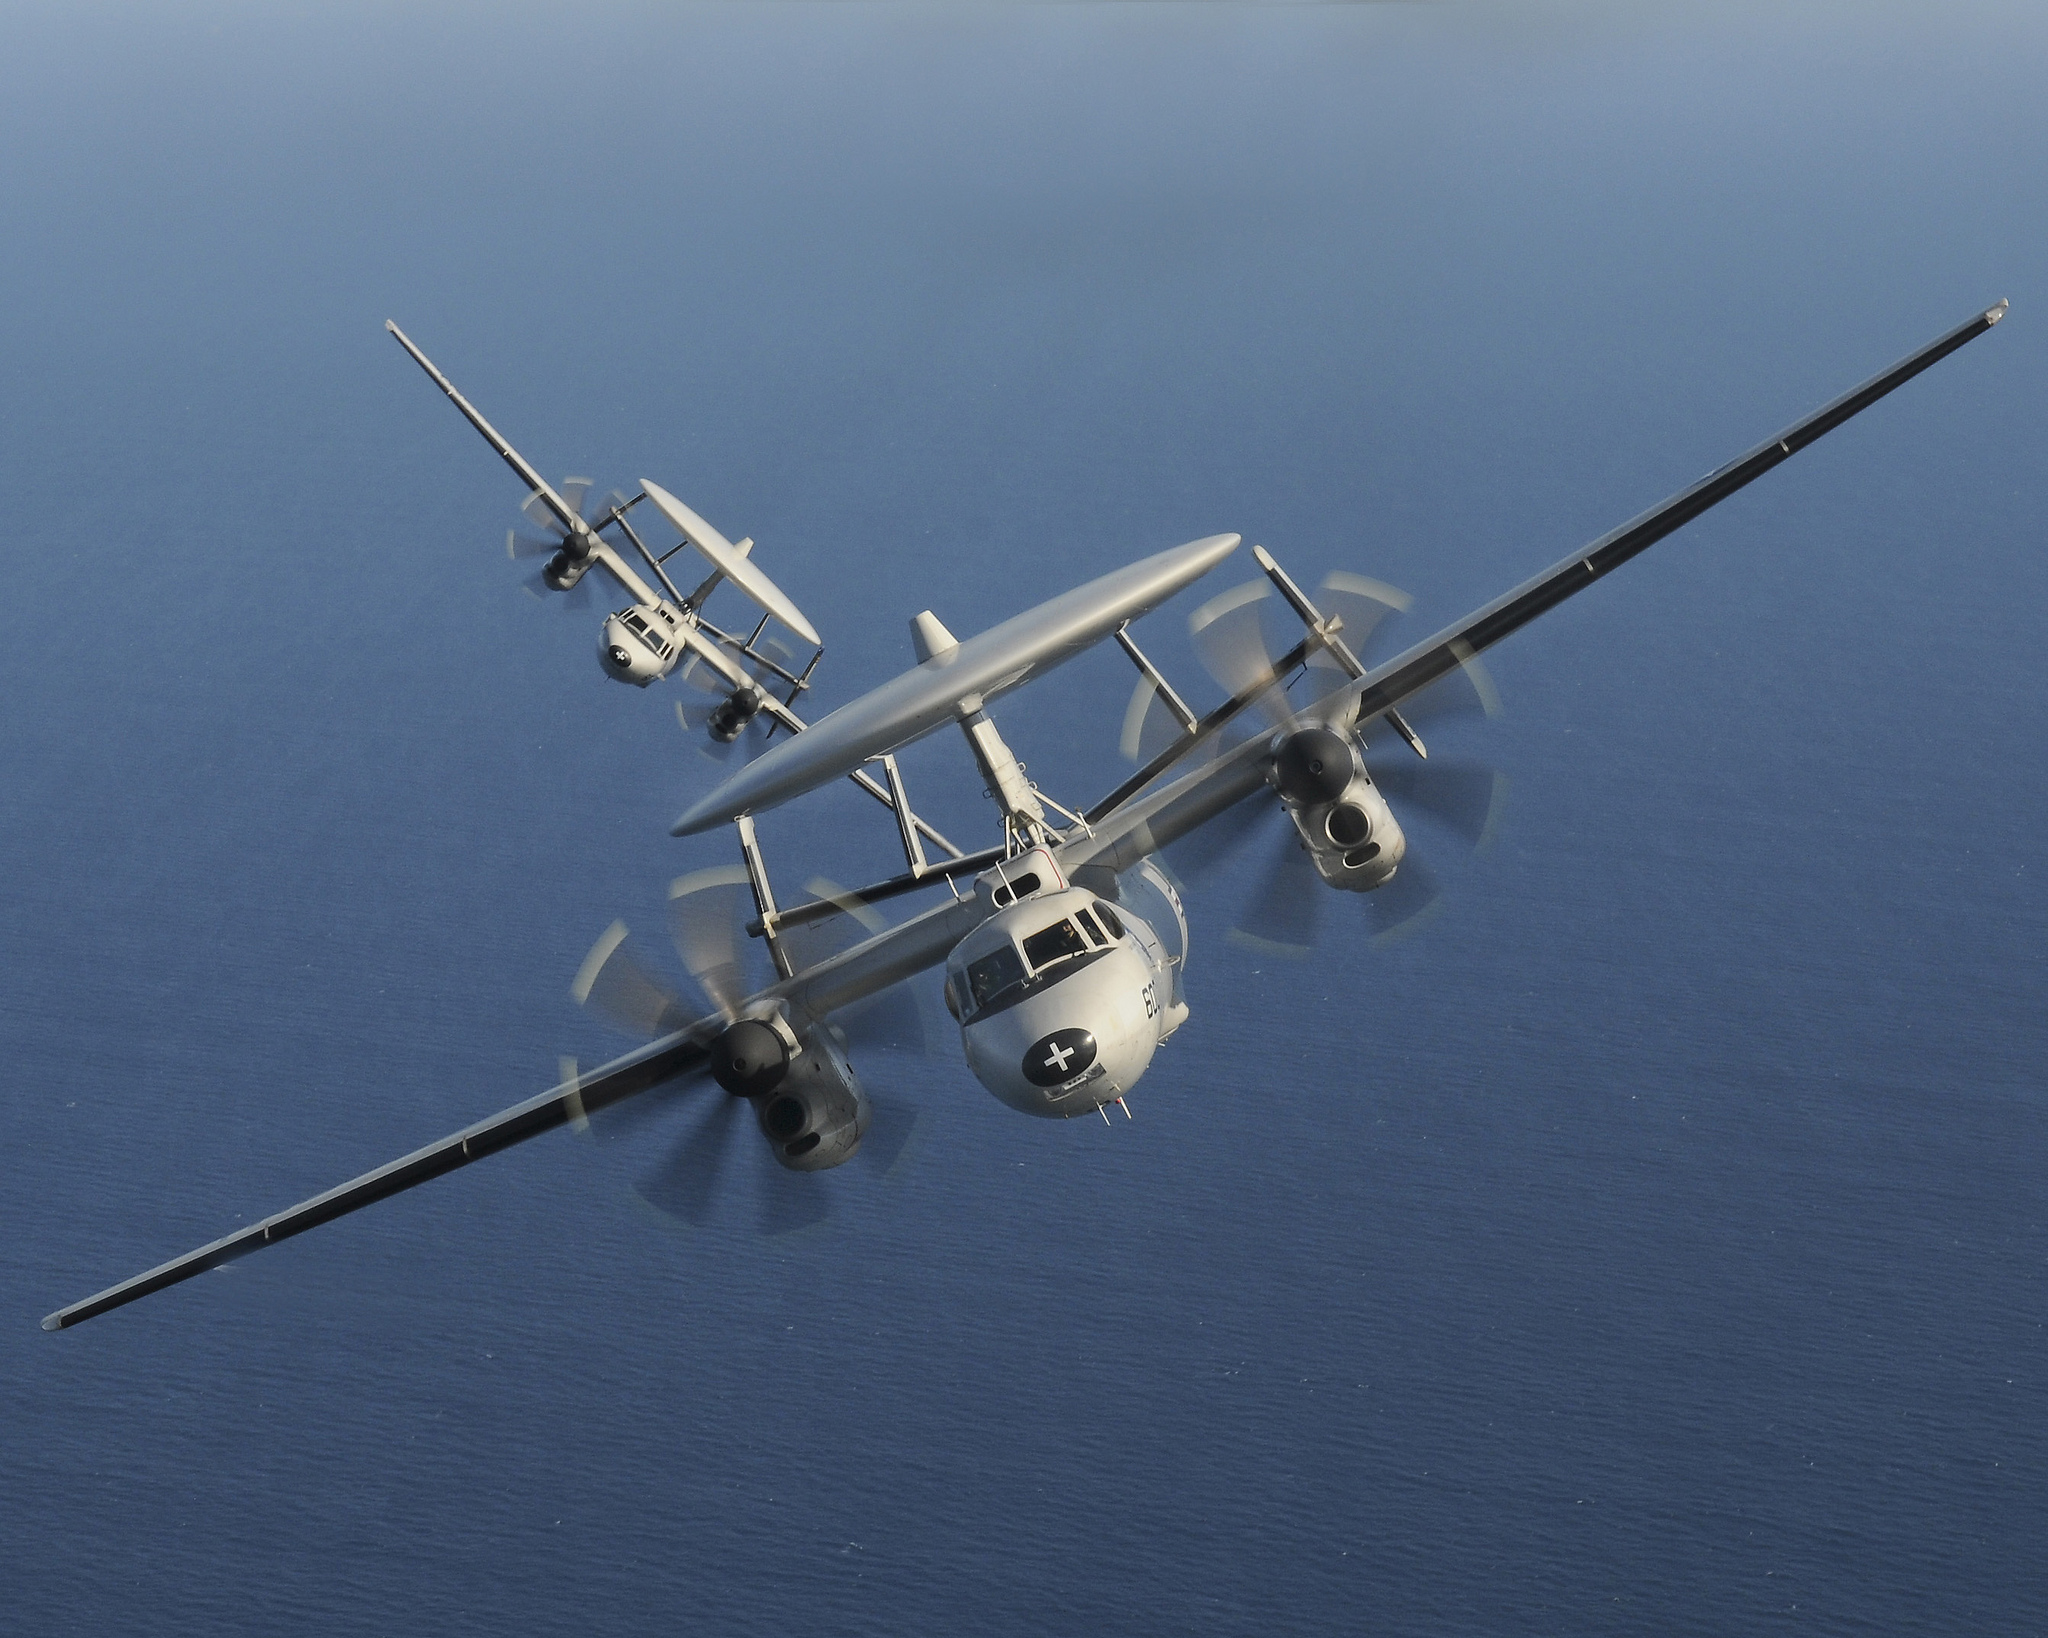 Northrop Grumman's E-2D Advanced Hawkeye: The U.S. Navy's Eyes and Ears Just Got Long Legs